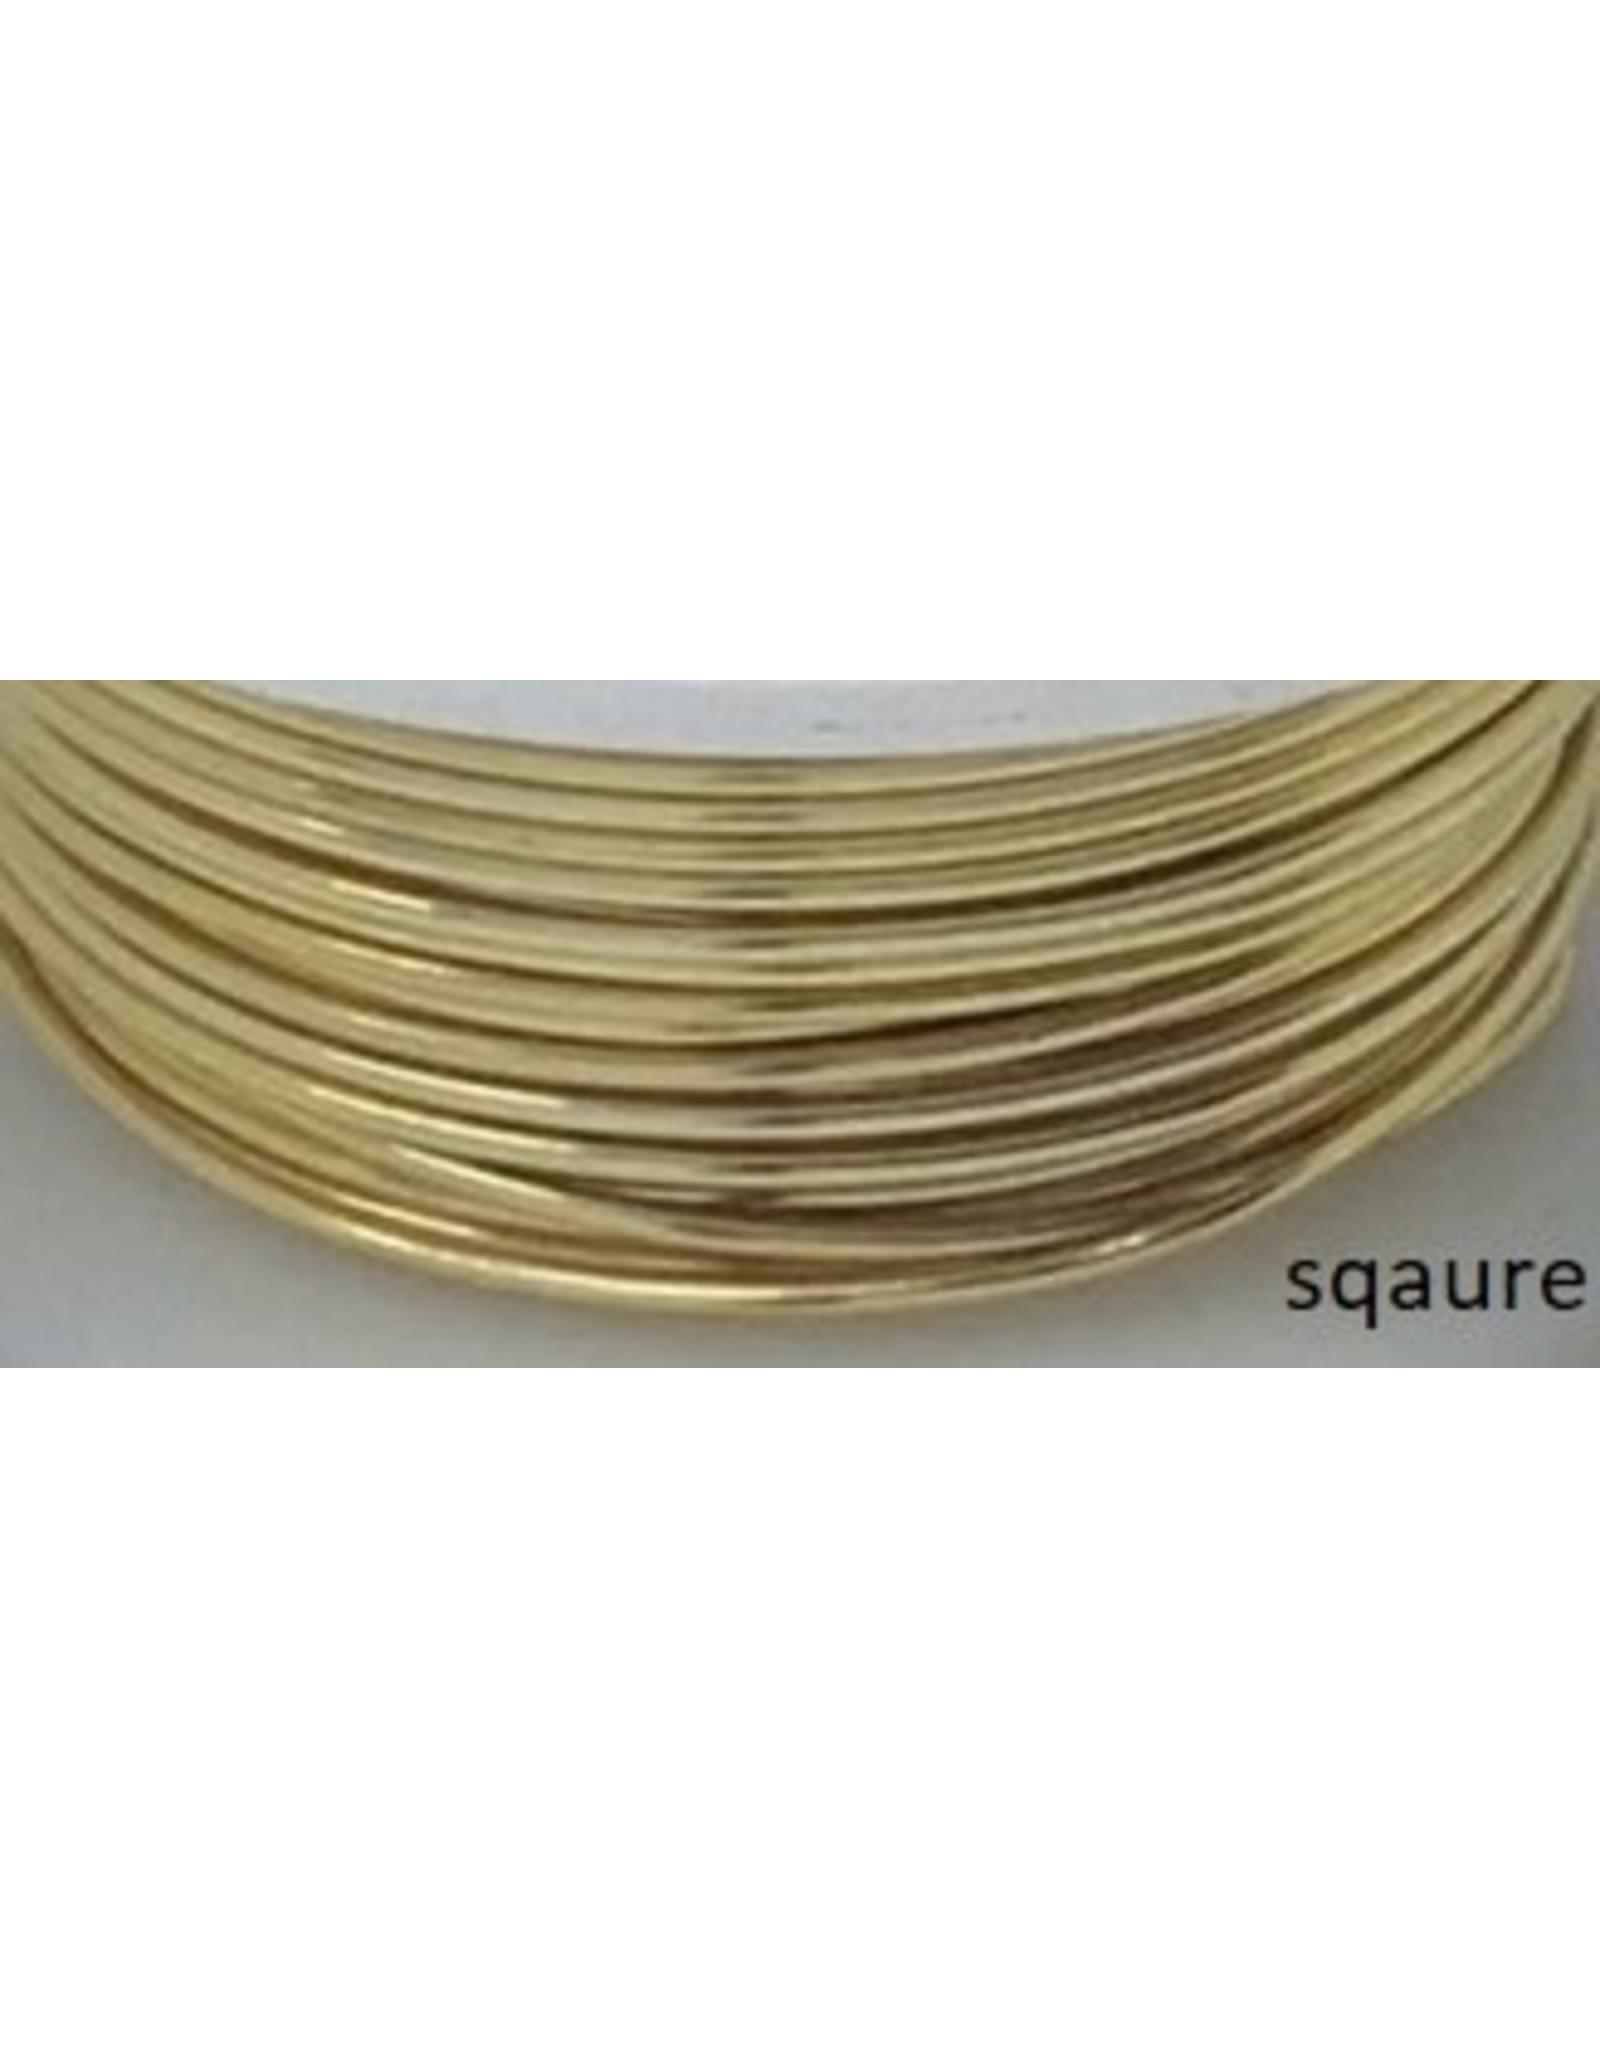 21g  Square Non Tarnish Gold  7y